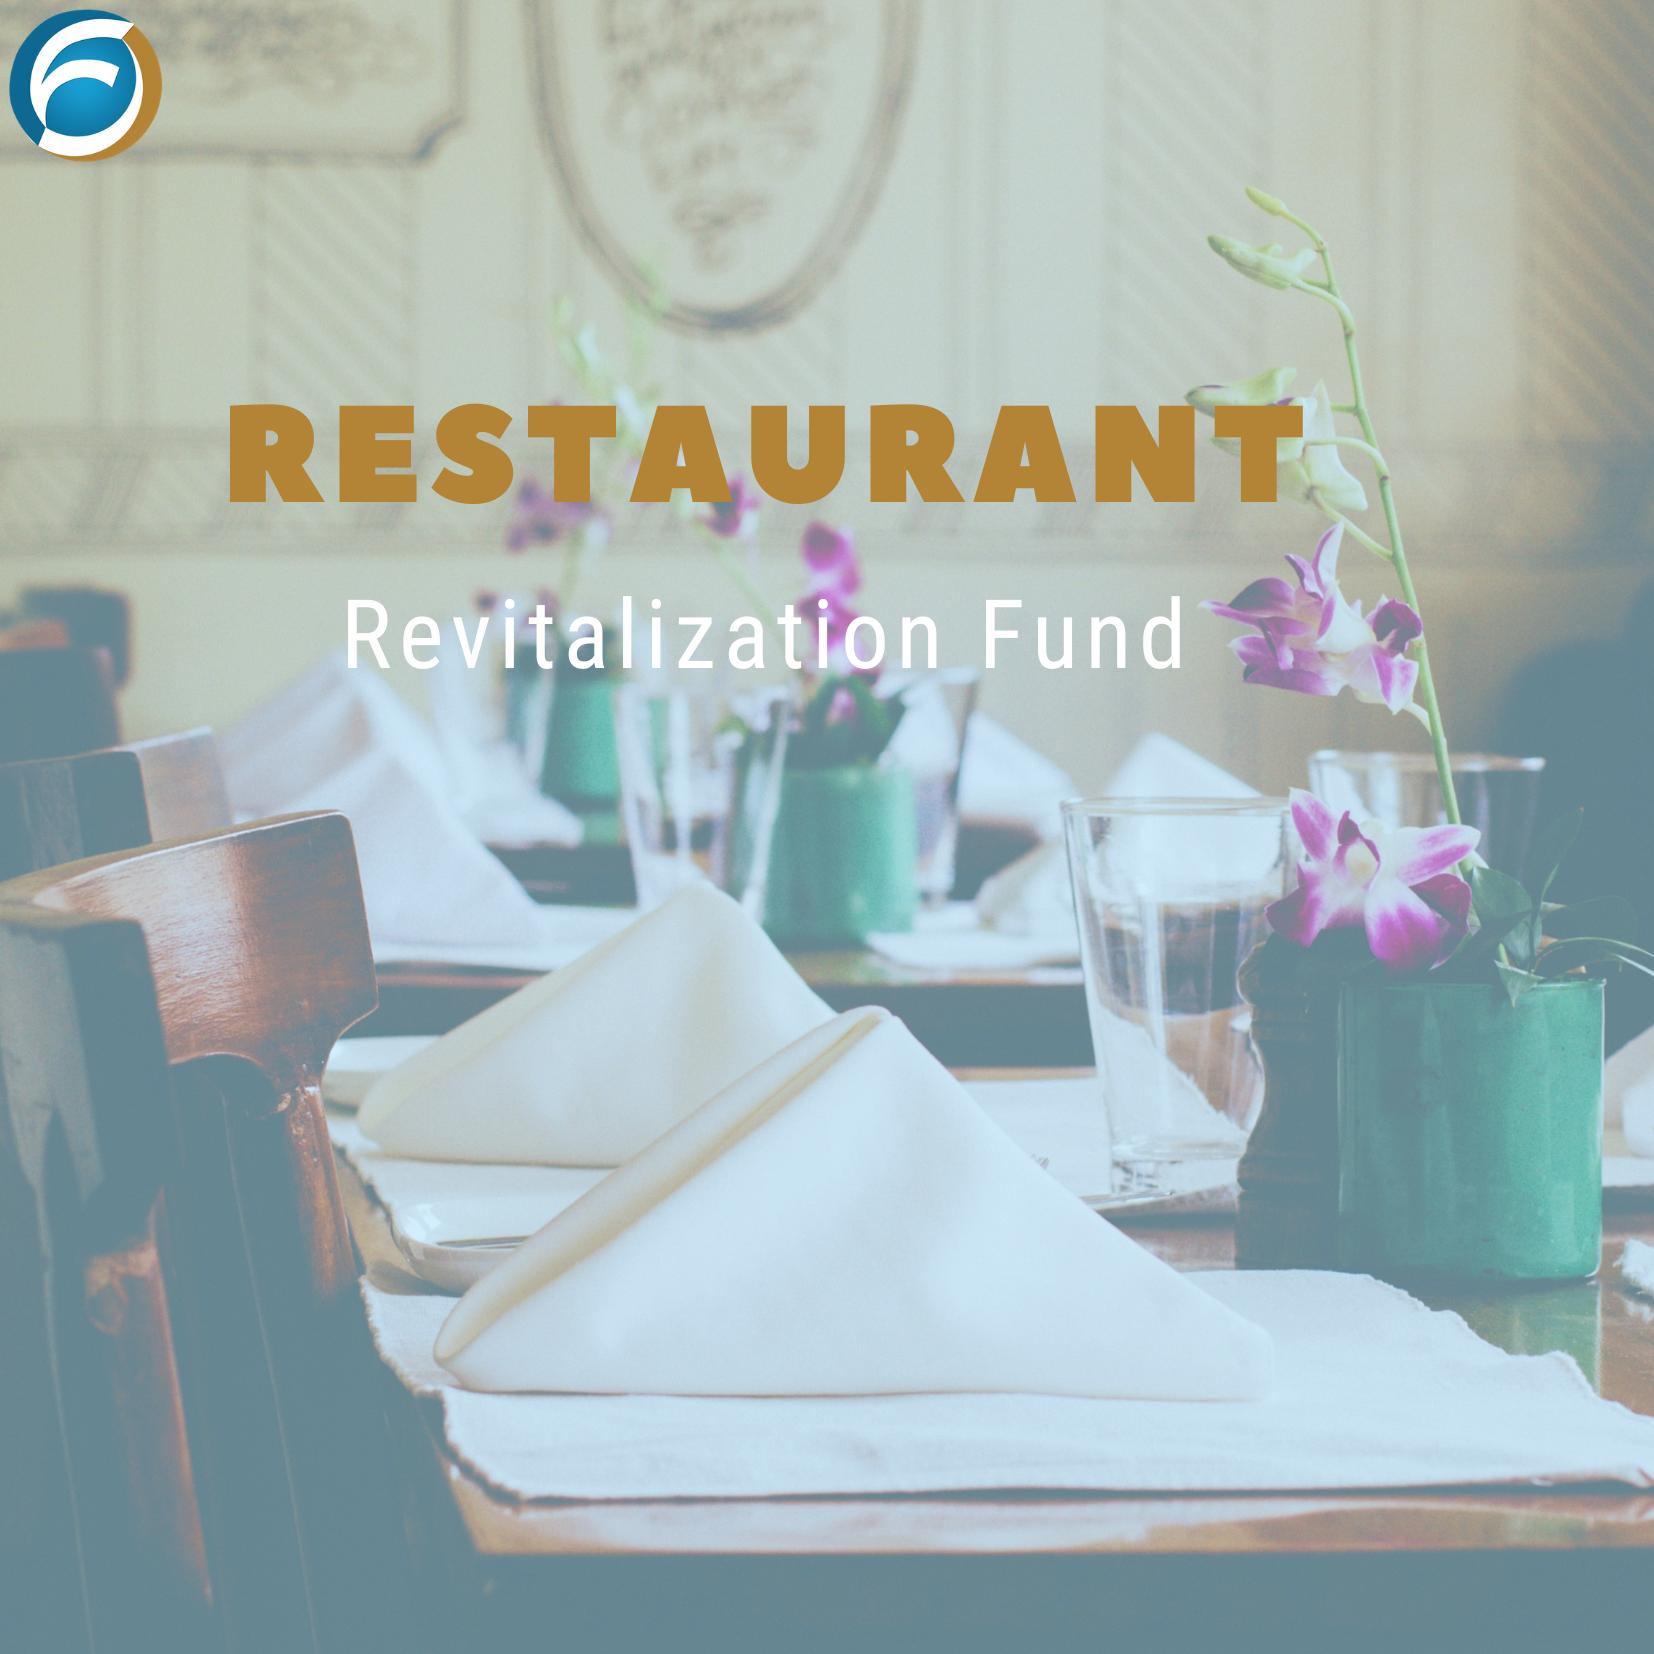 Restaurant Revitalization Fund - SBA